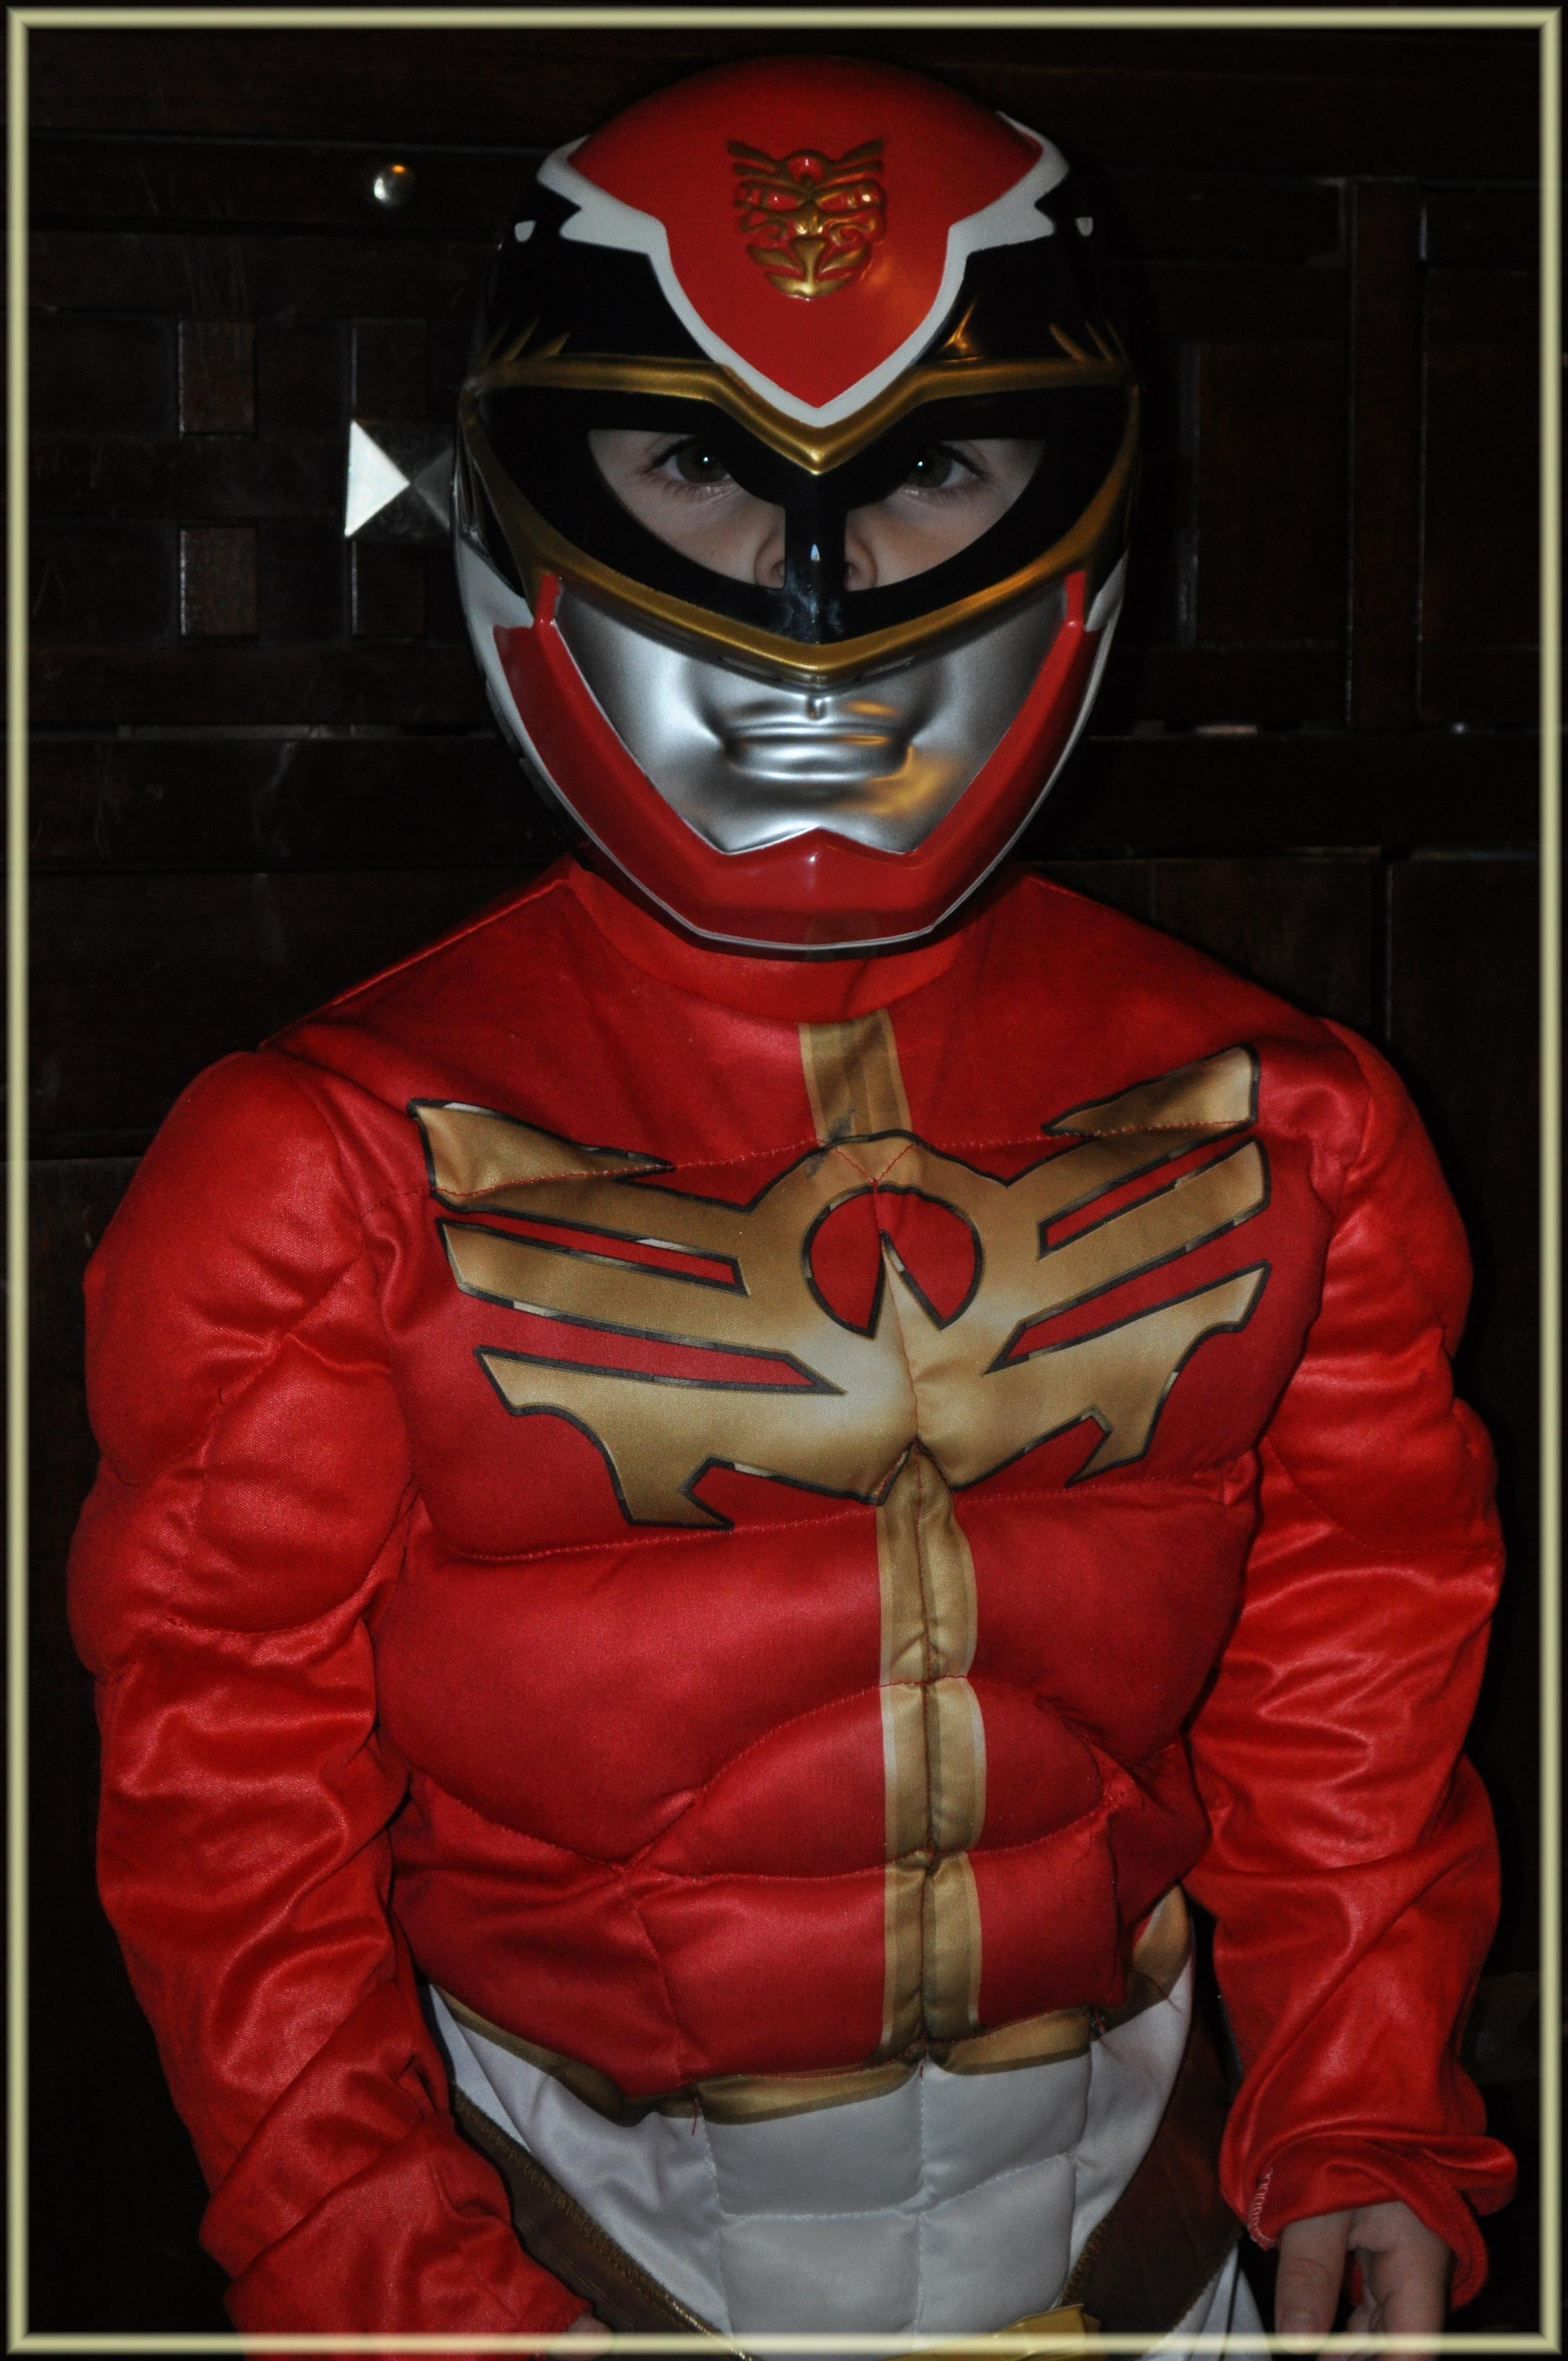 spiderman costume kohls kids power ranger costumes & Halloween Costumes at Kohlu0027s For The Whole Family - Mommyu0027s Fabulous ...